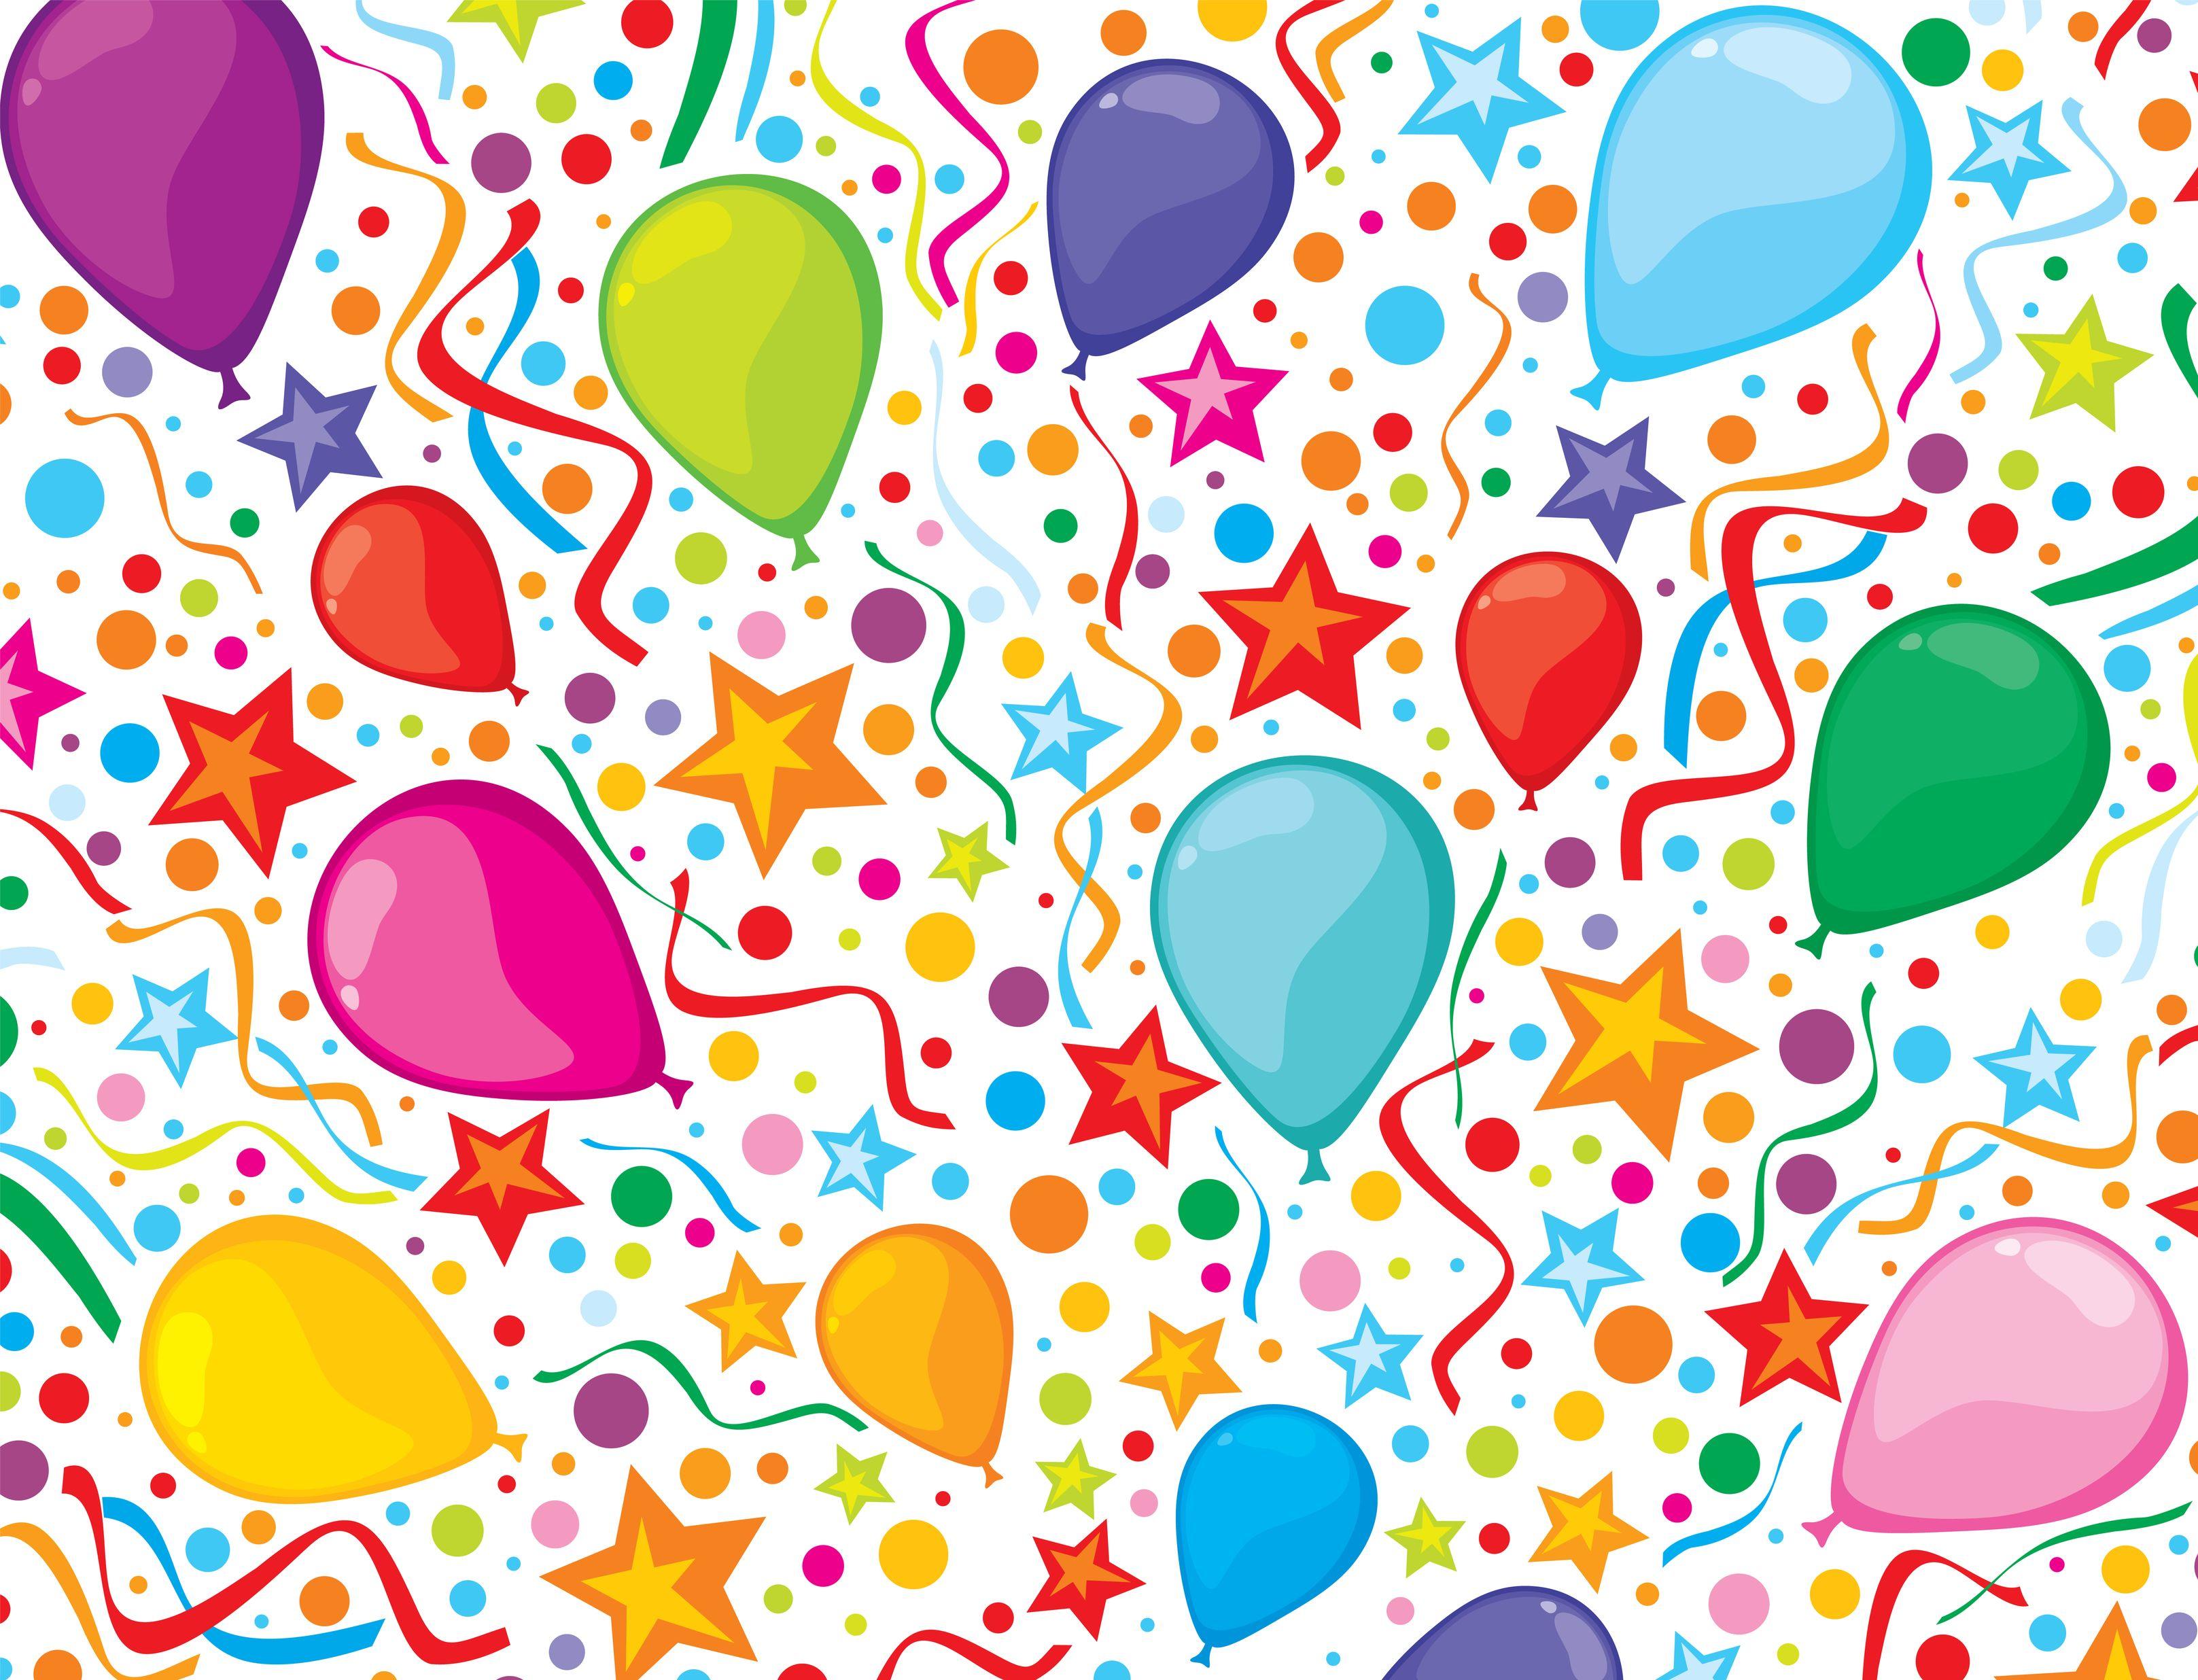 http://kdgrace.co.uk/blog/happy-4th-birthday-holly/# ...